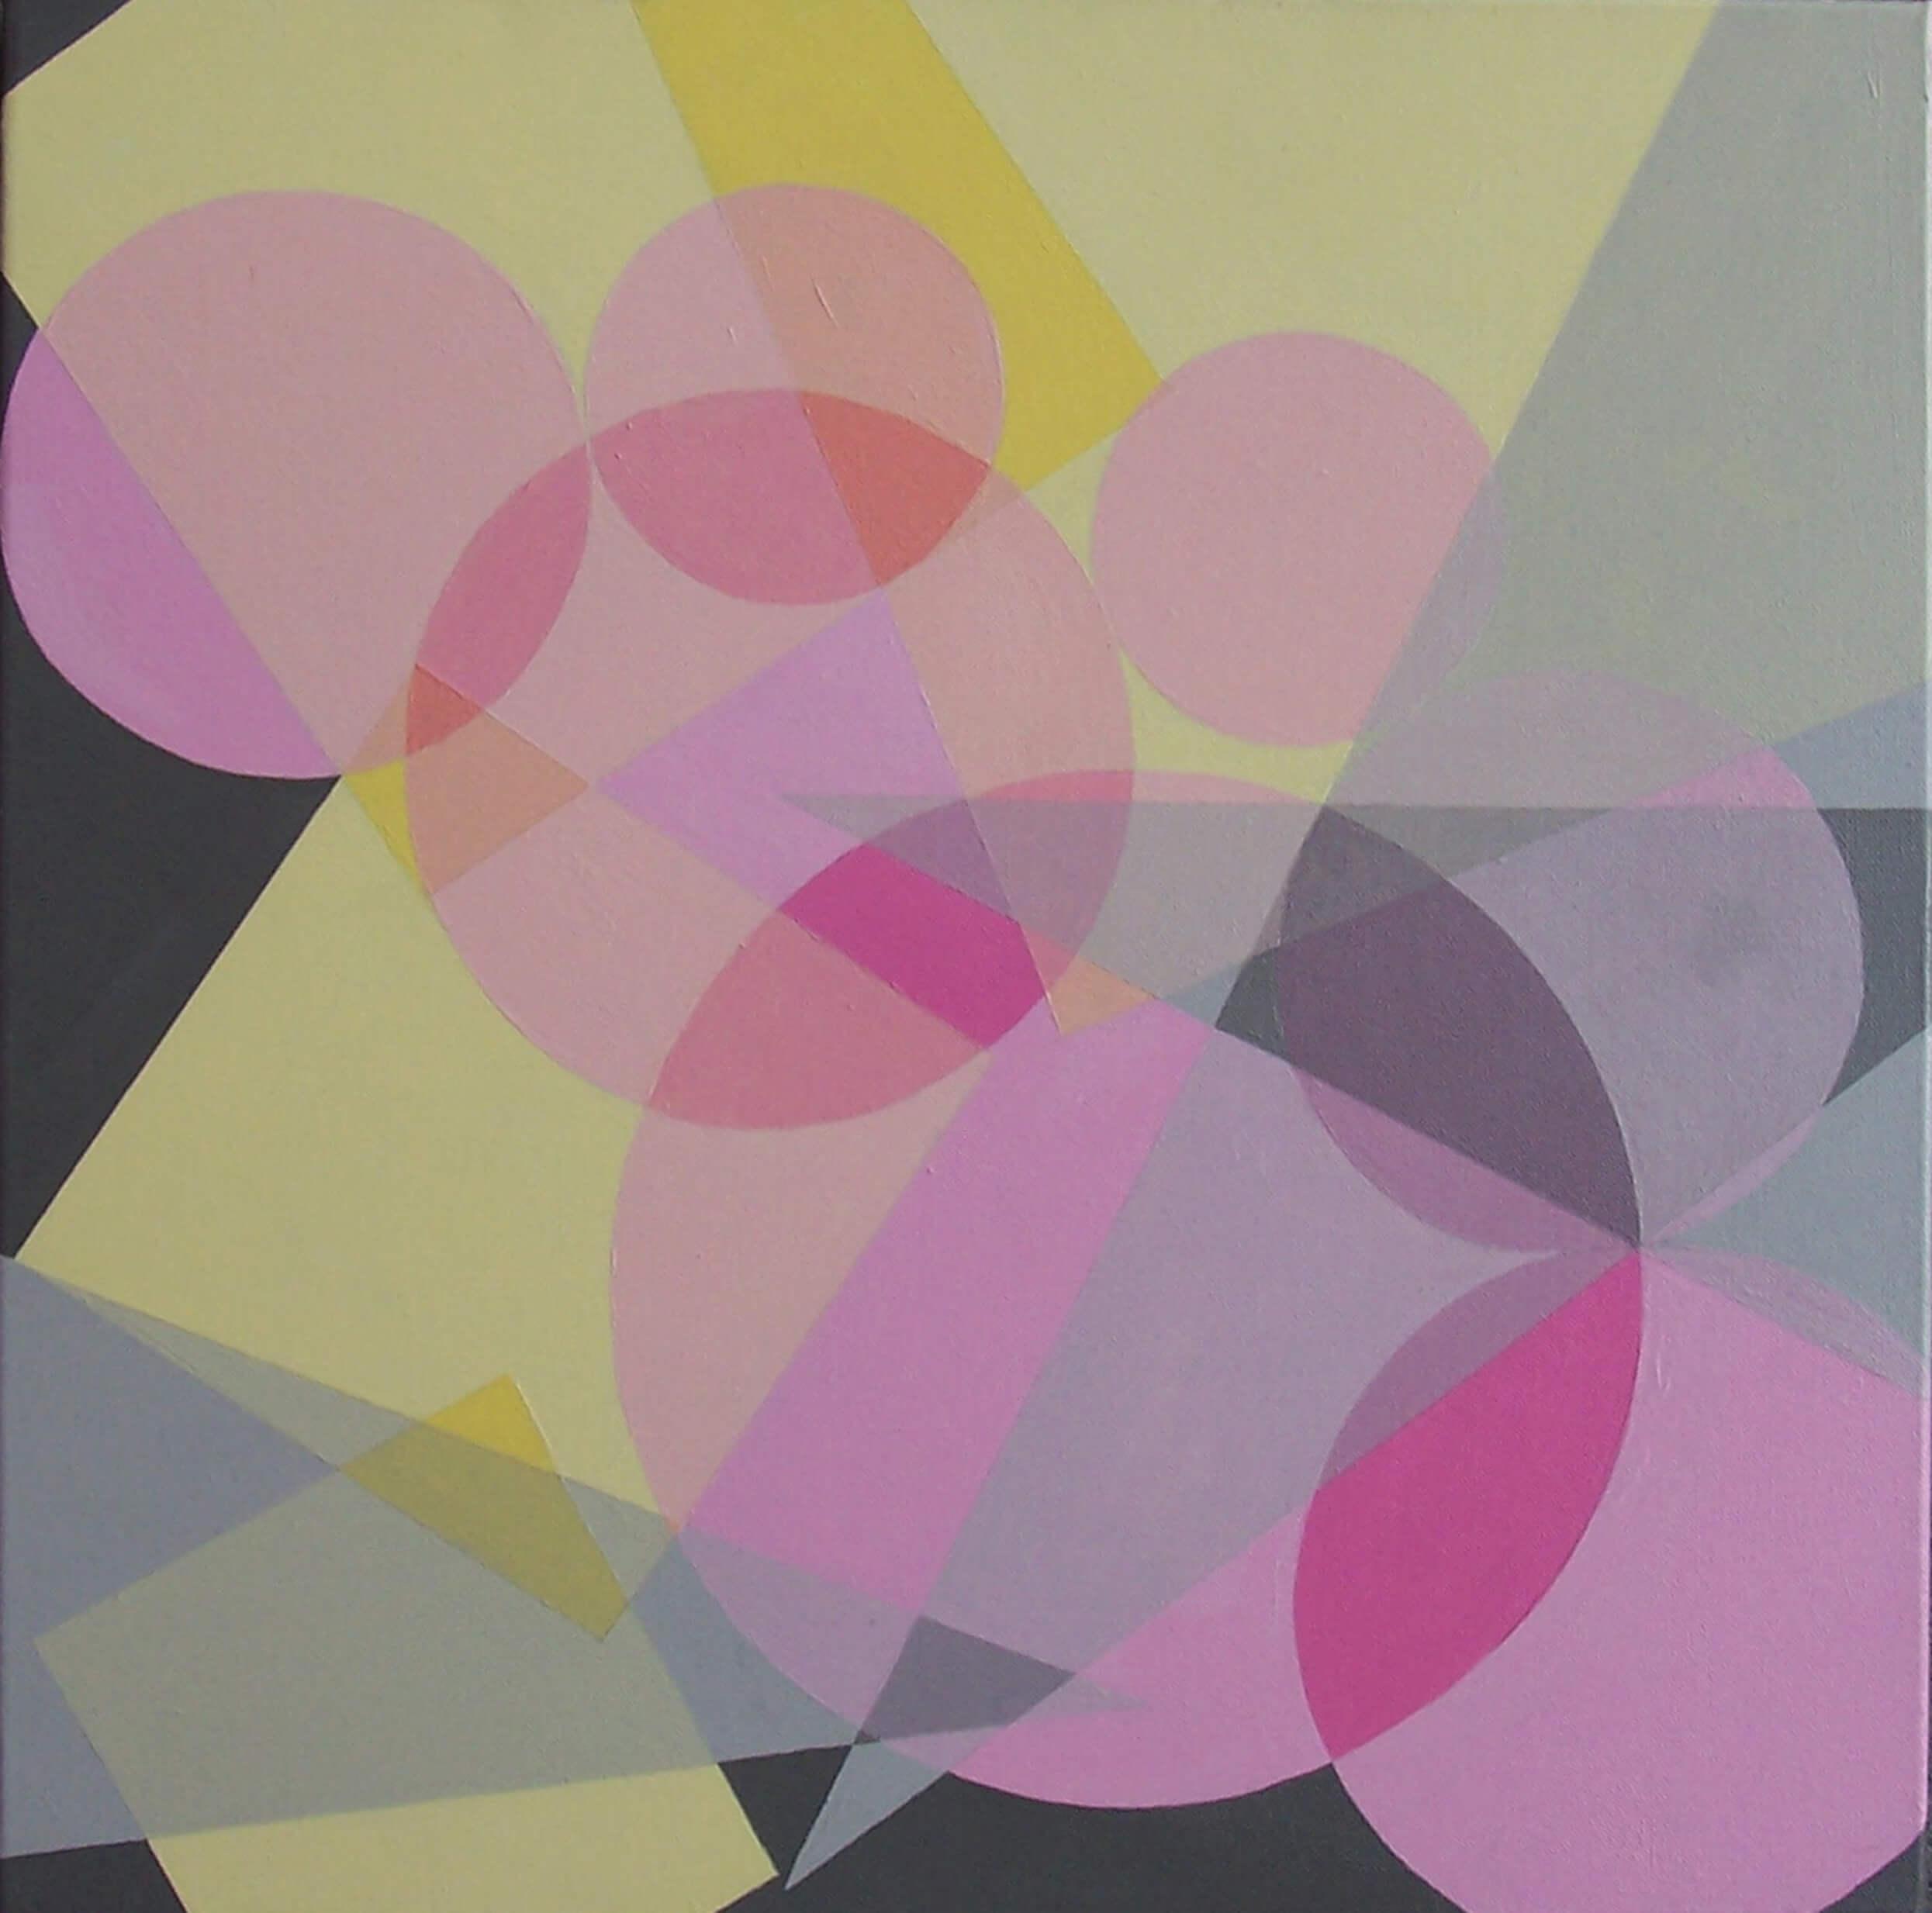 Rebecca Zelanin - In the Pink